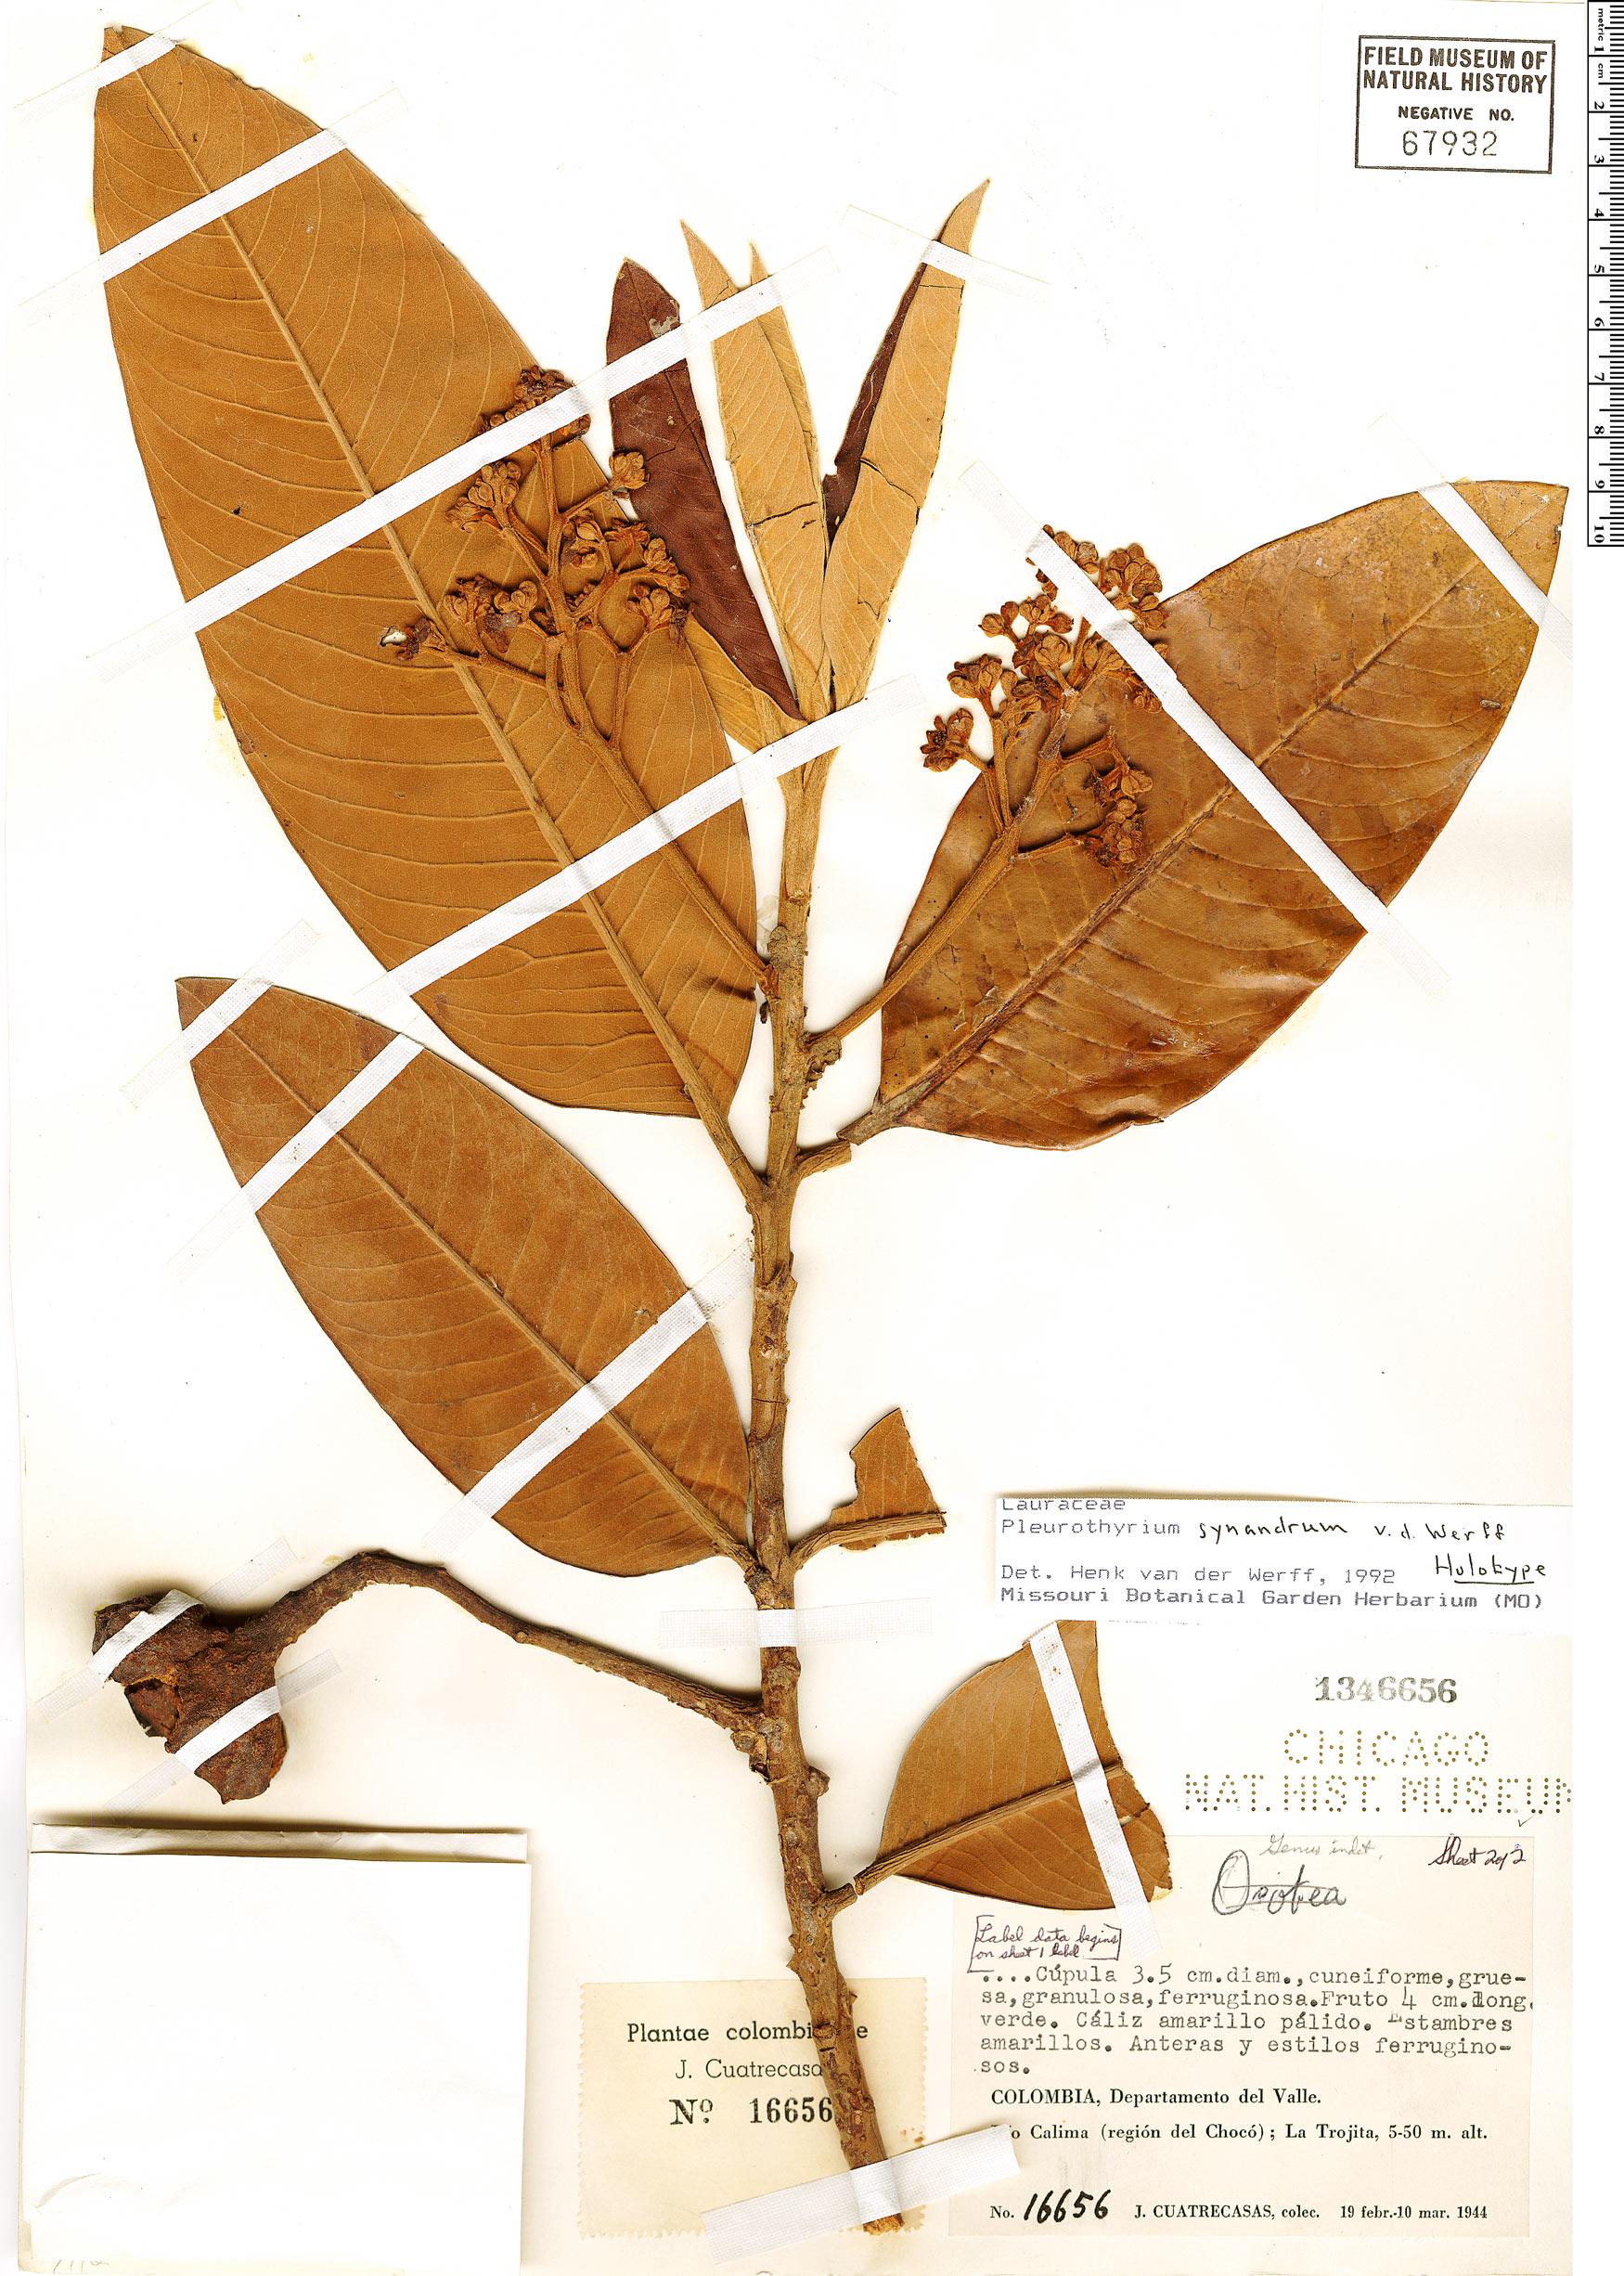 Specimen: Pleurothyrium synandrum